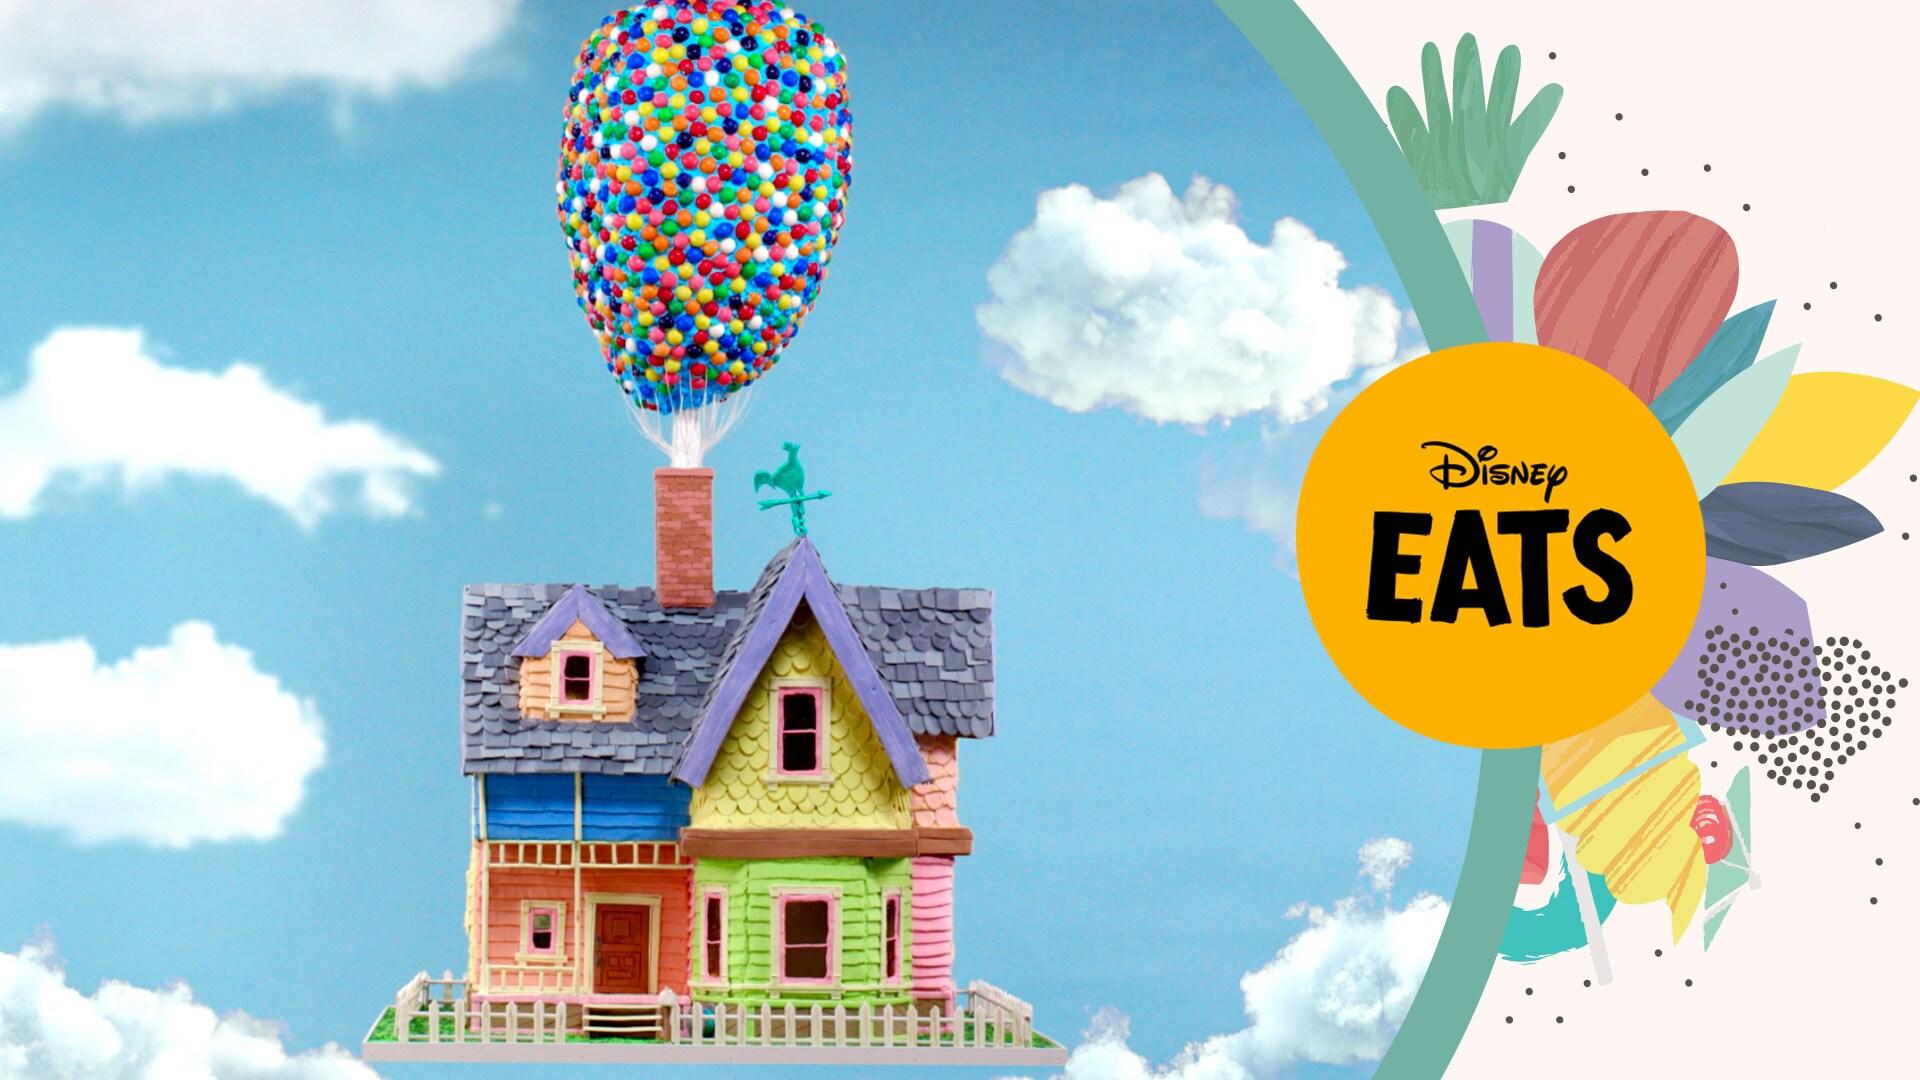 Giant UP Gingerbread House | Disney Eats